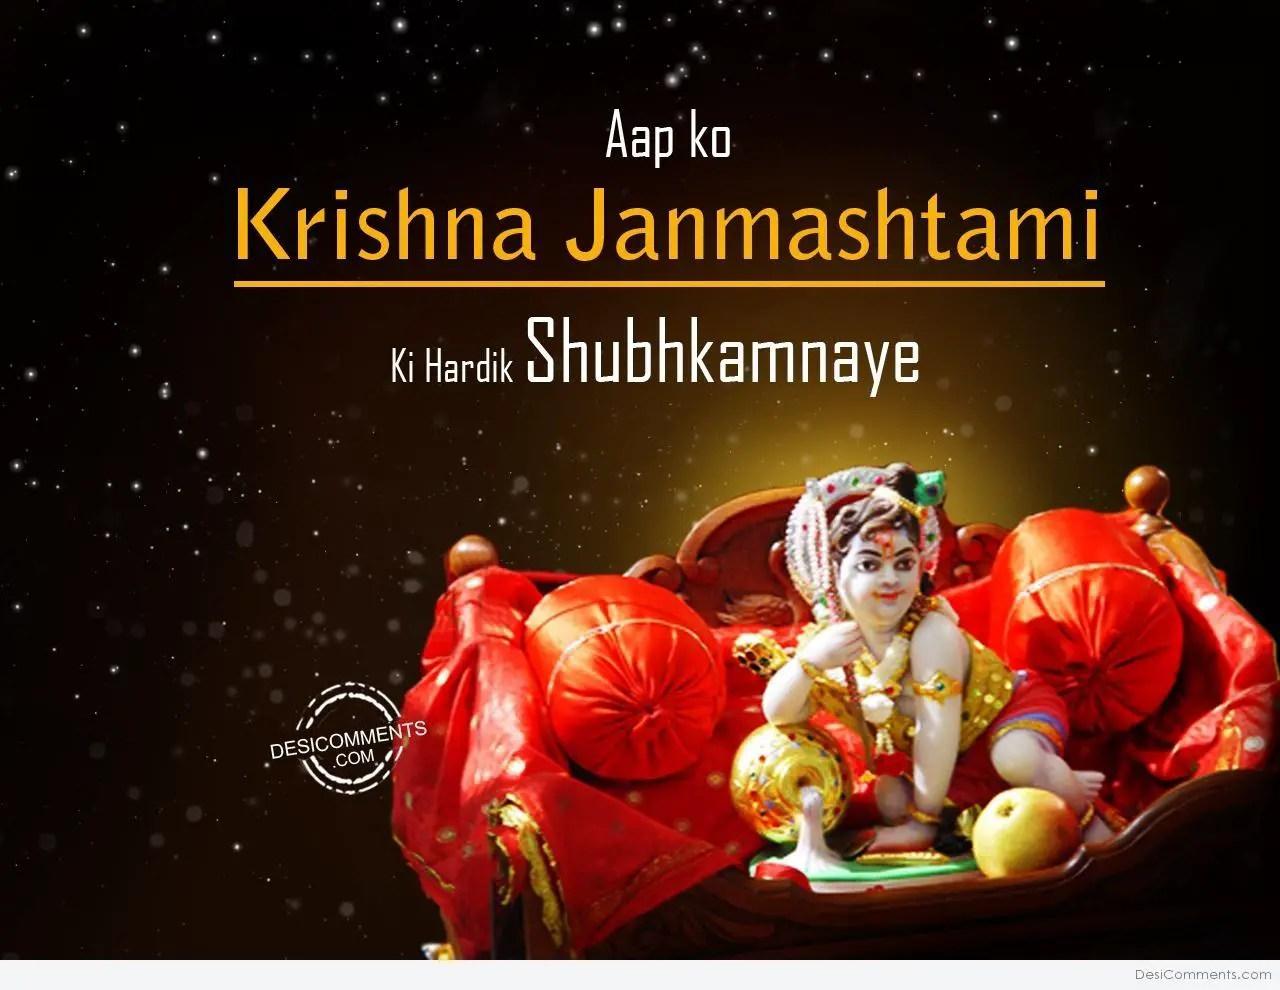 Aap Ko Krishna Janmashtami Ki Hardik Shubhkamnaye